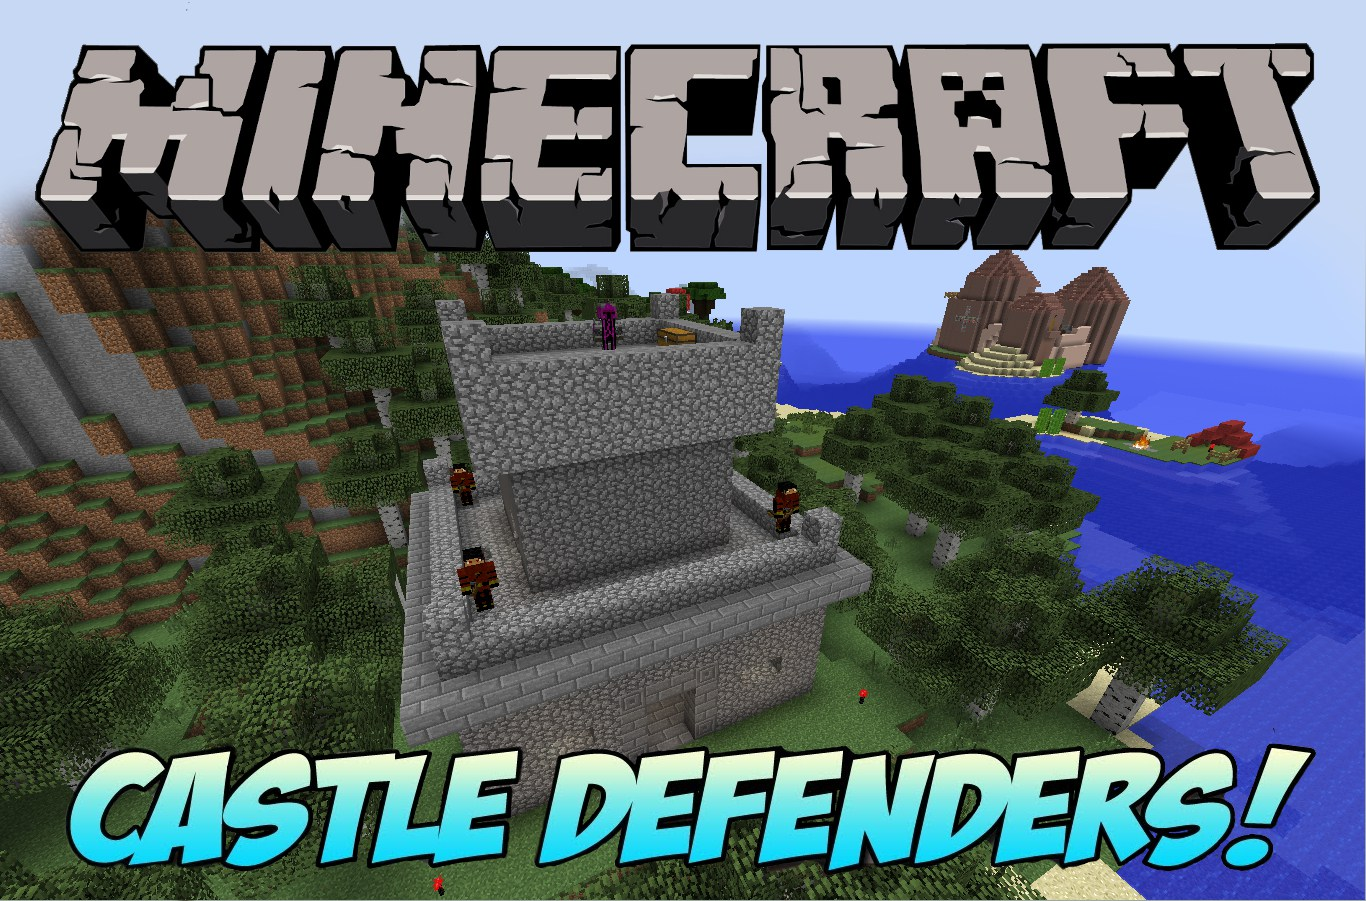 The Castle Defender Mod 1